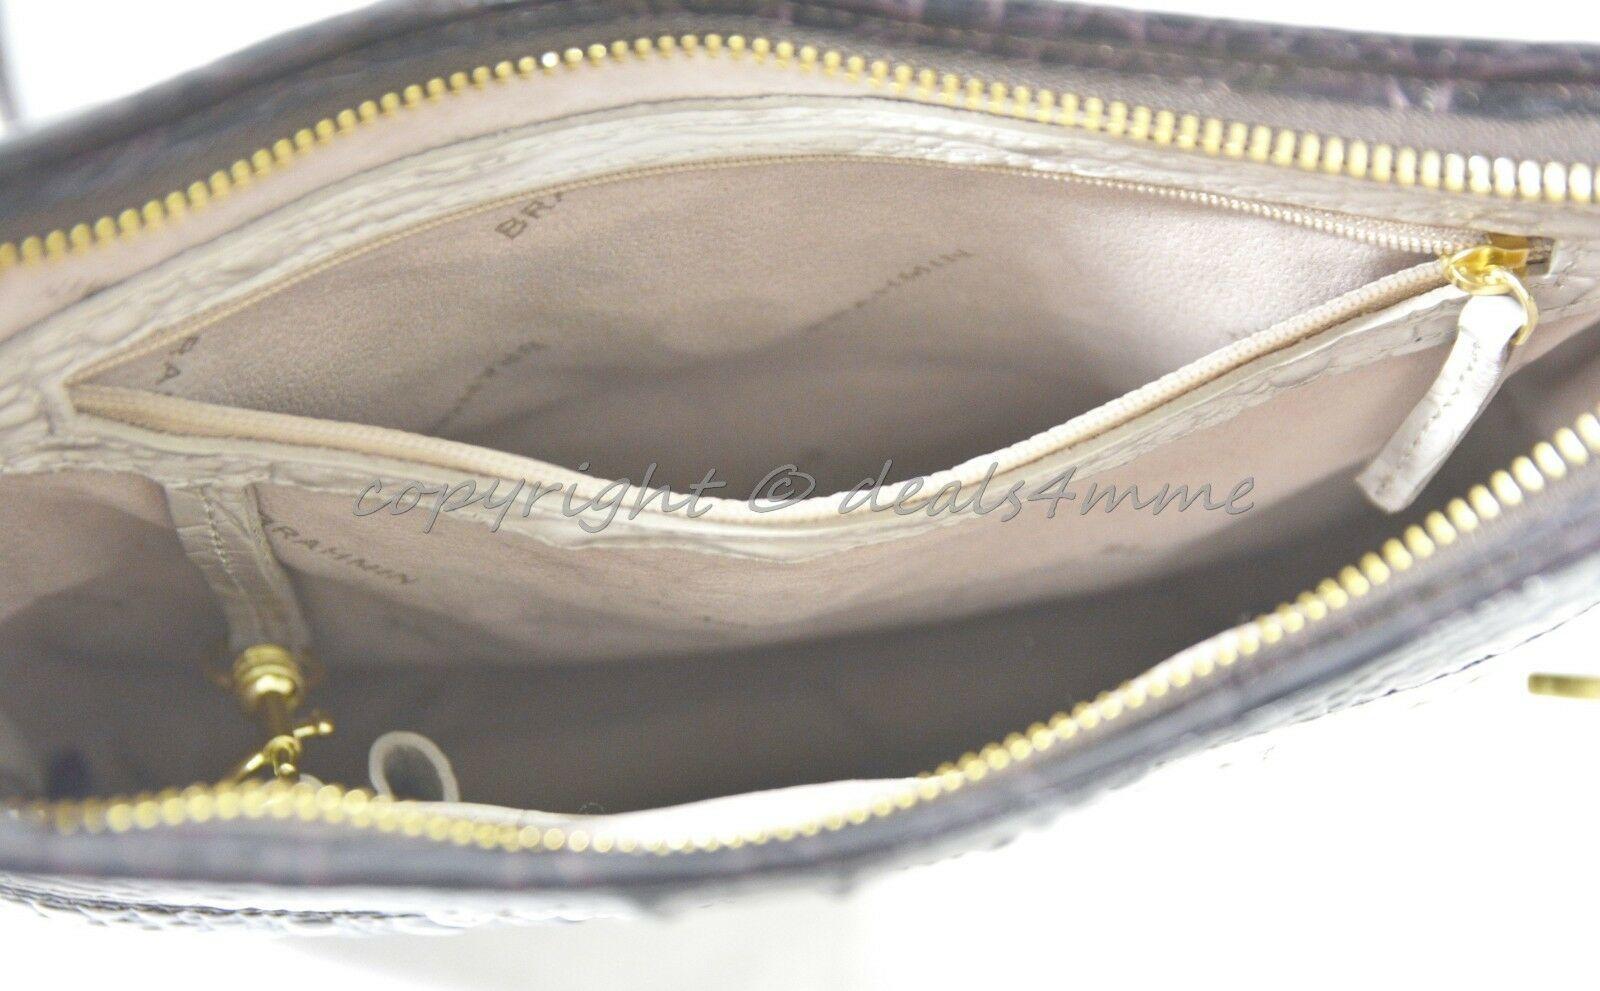 NWT Brahmin Jody Striped Cross-Body/Shoulder Bag in Angora Vineyard image 8